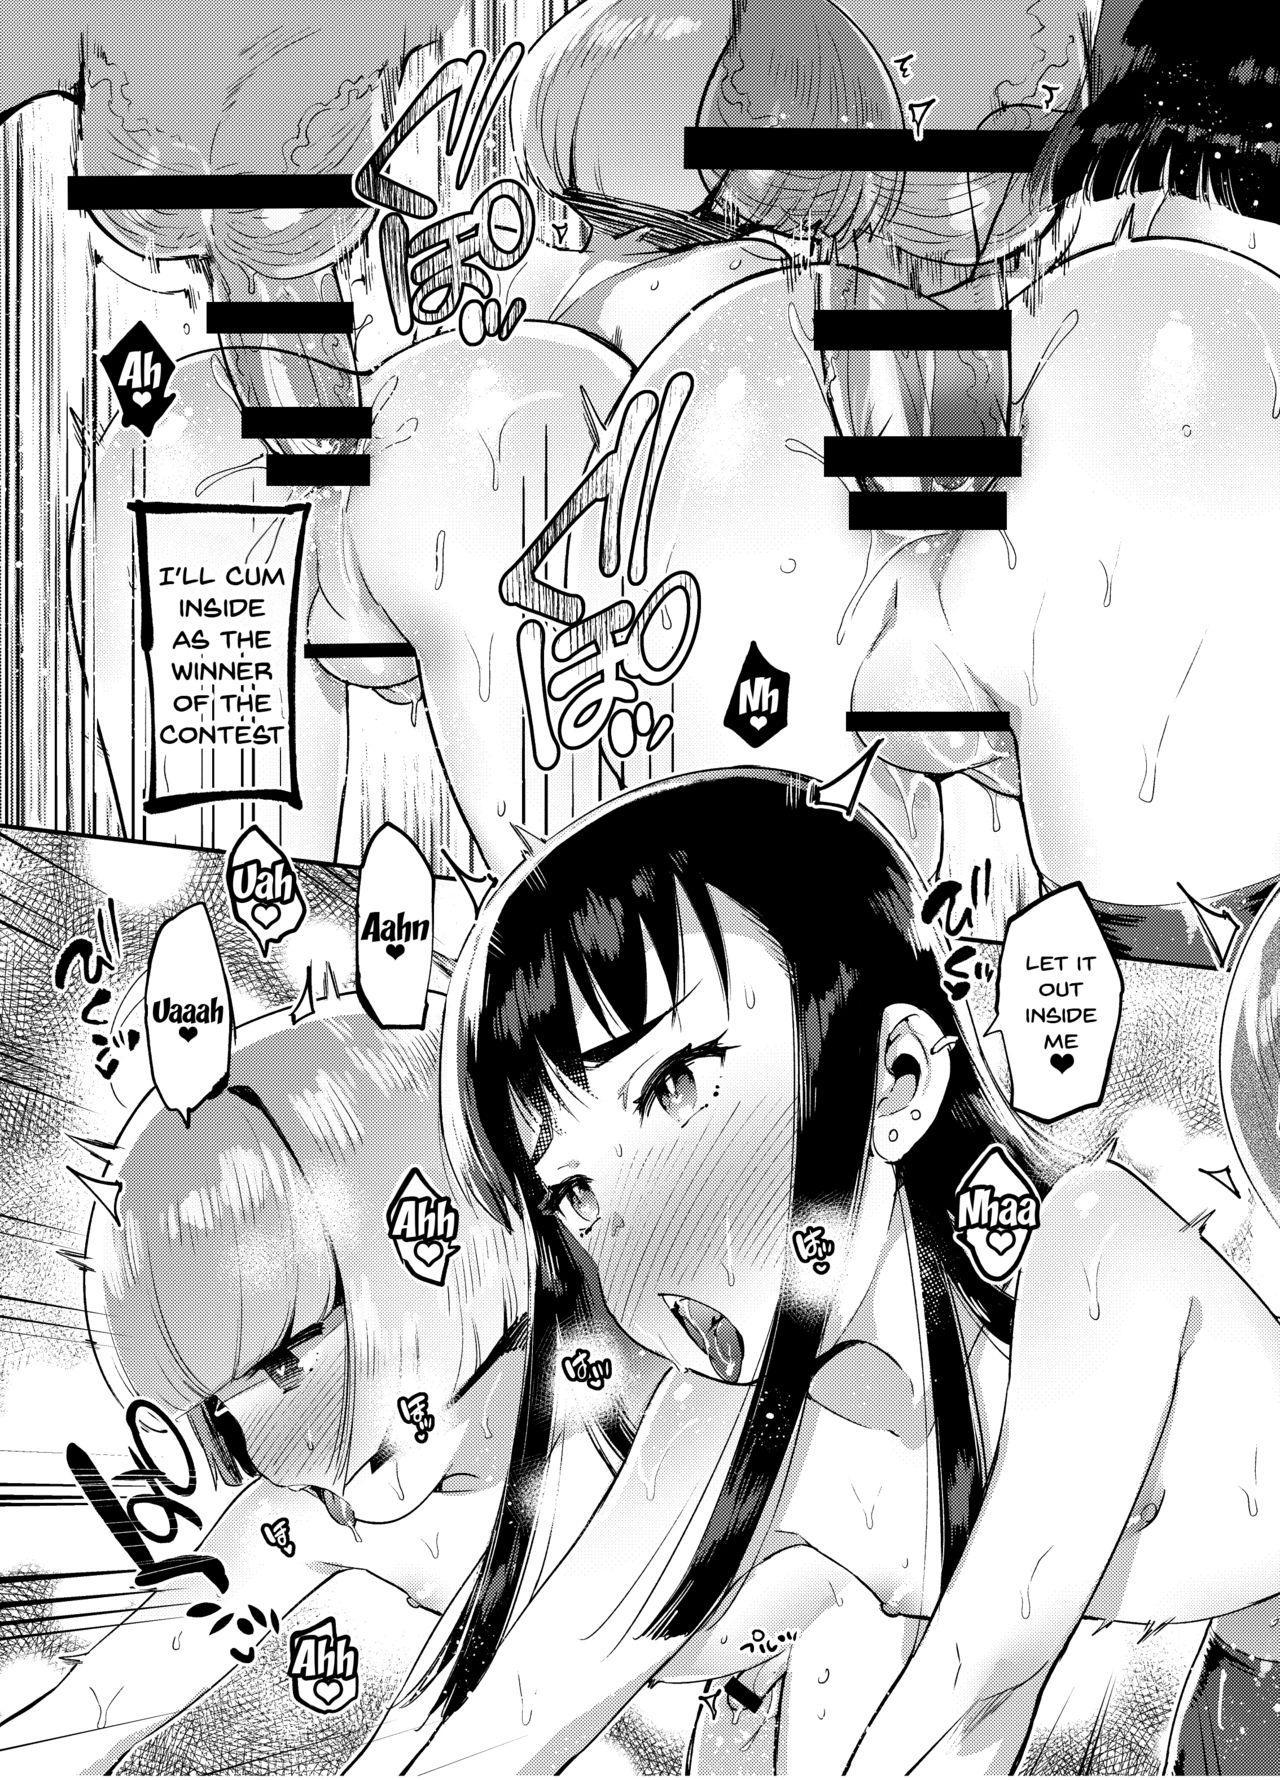 Kan Josou no Pro ni Manabu Enkou no Susume 28